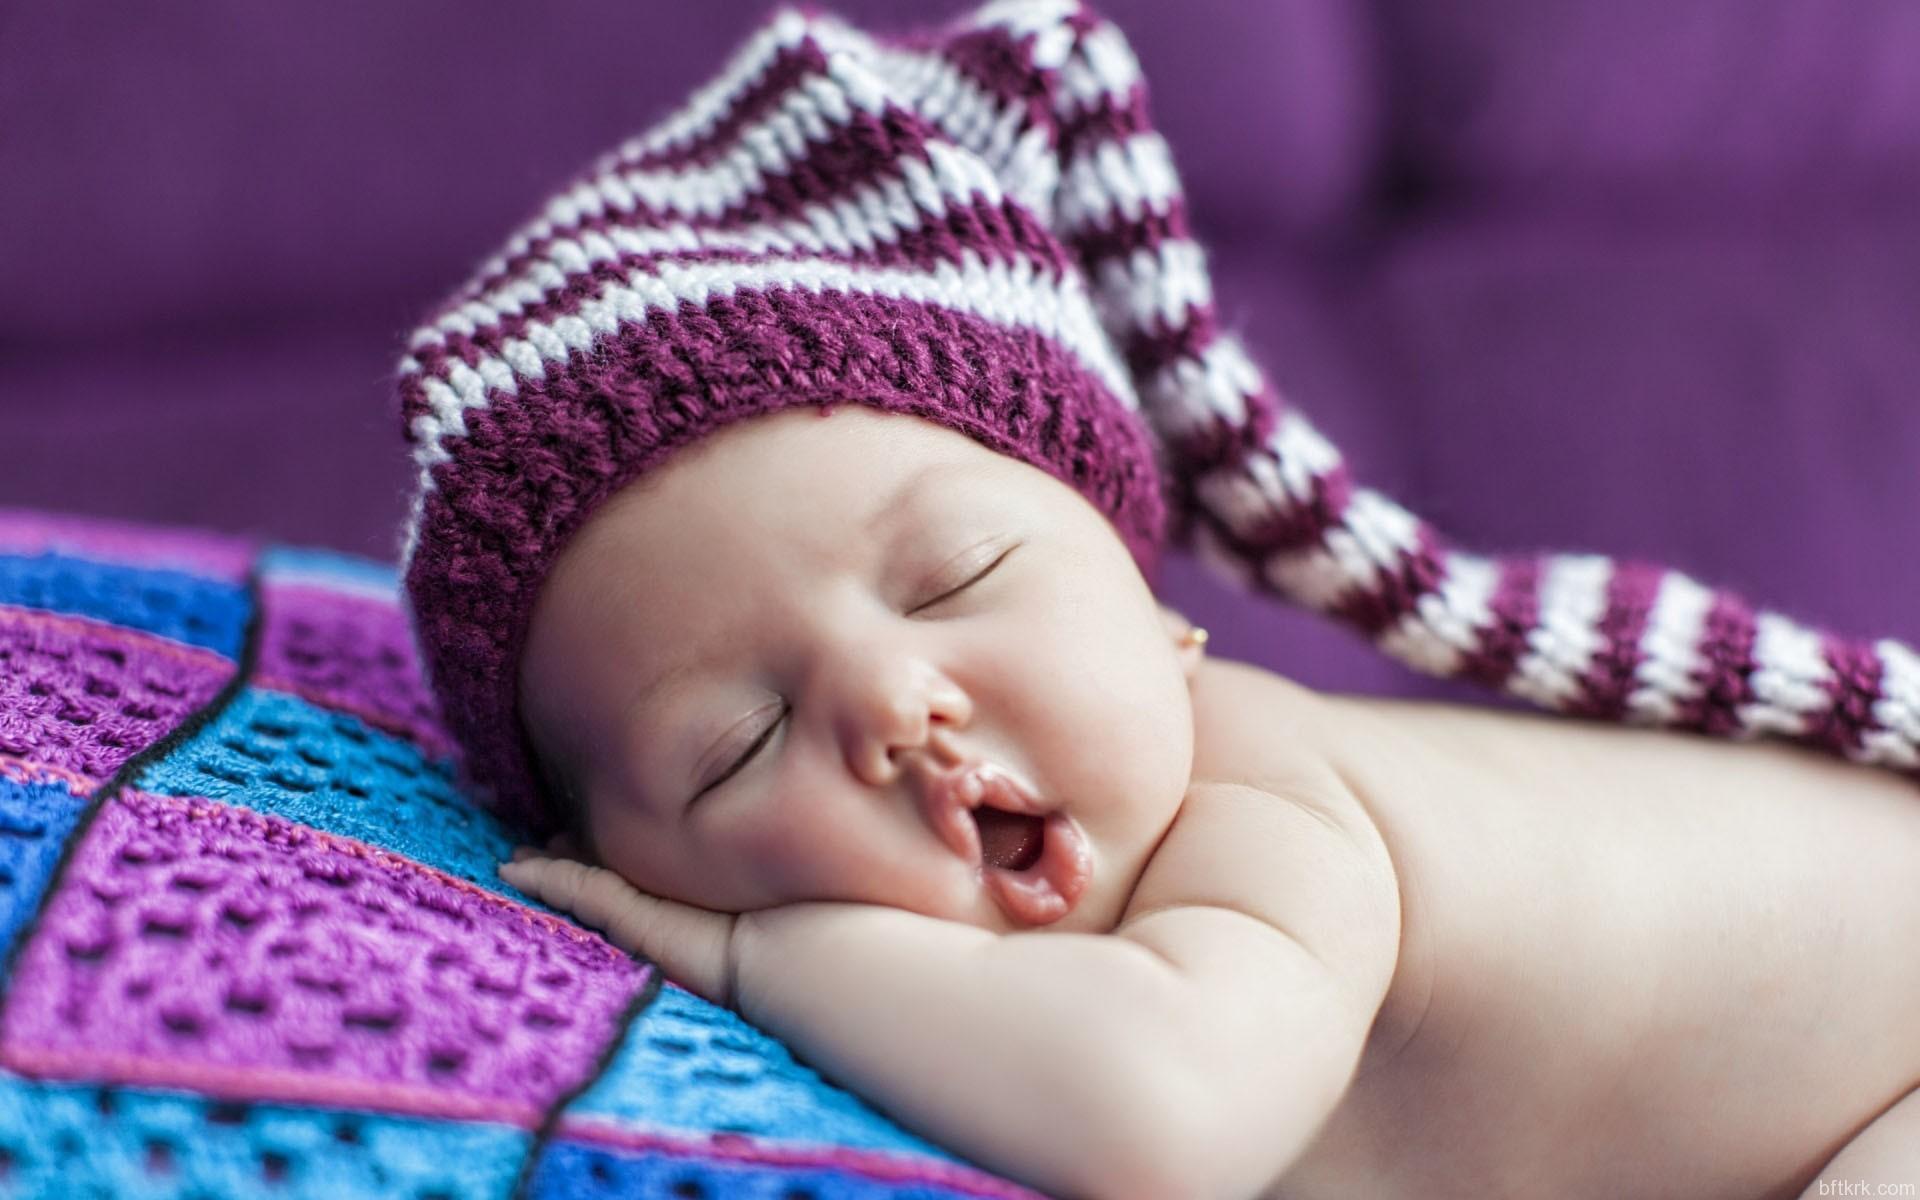 بالصور صور اطفال حلوين , اجمل صور لبرائه الاطفال 140 10